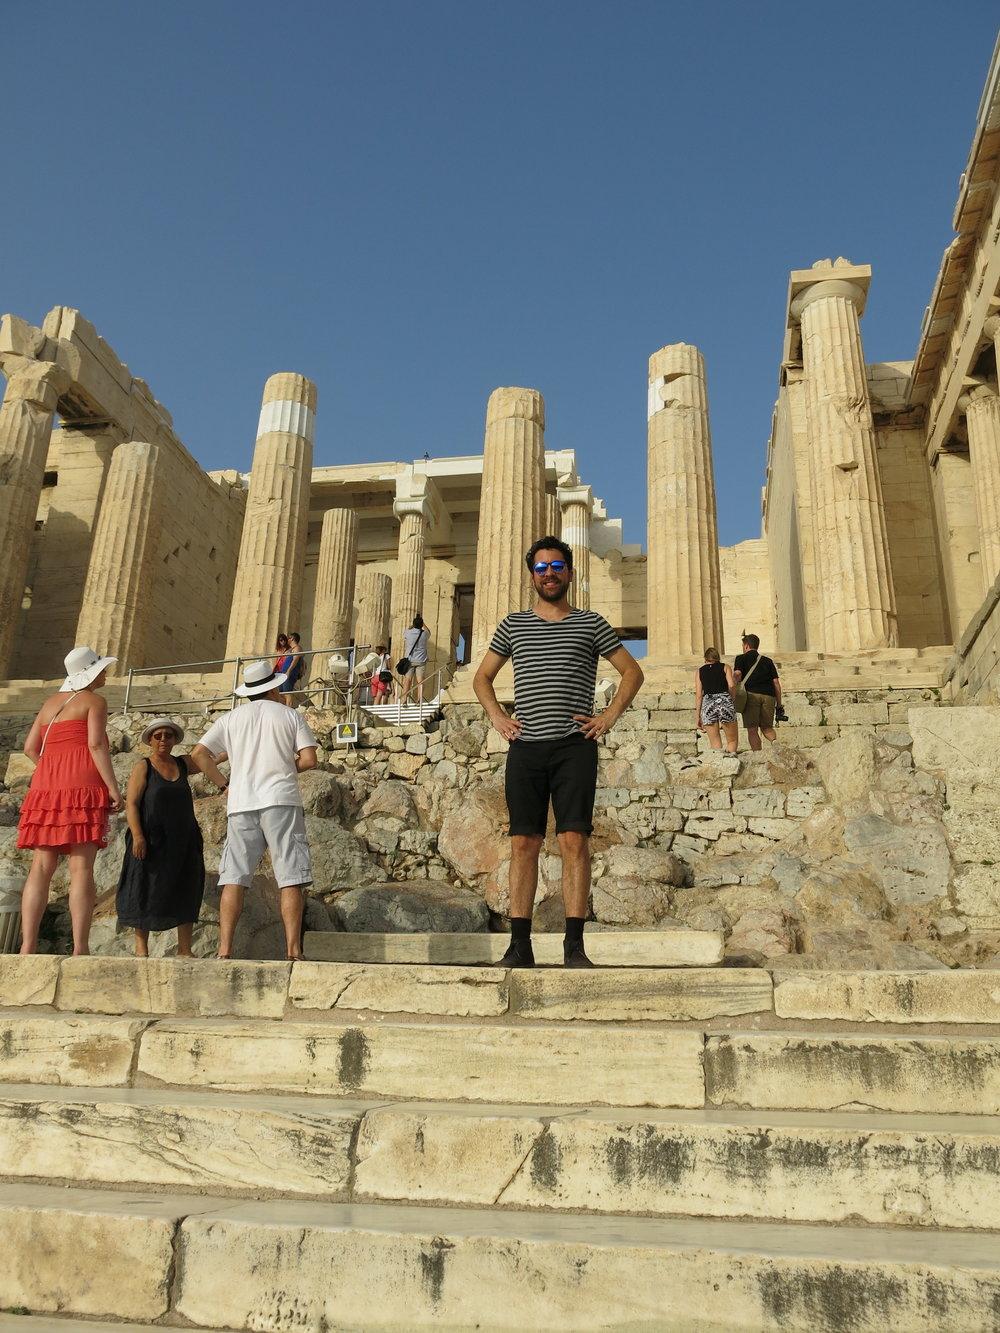 Milos Zahradka Maiorana, IDSVA student, on the steps of the Acropolis. Photo by Gabriel Reed.